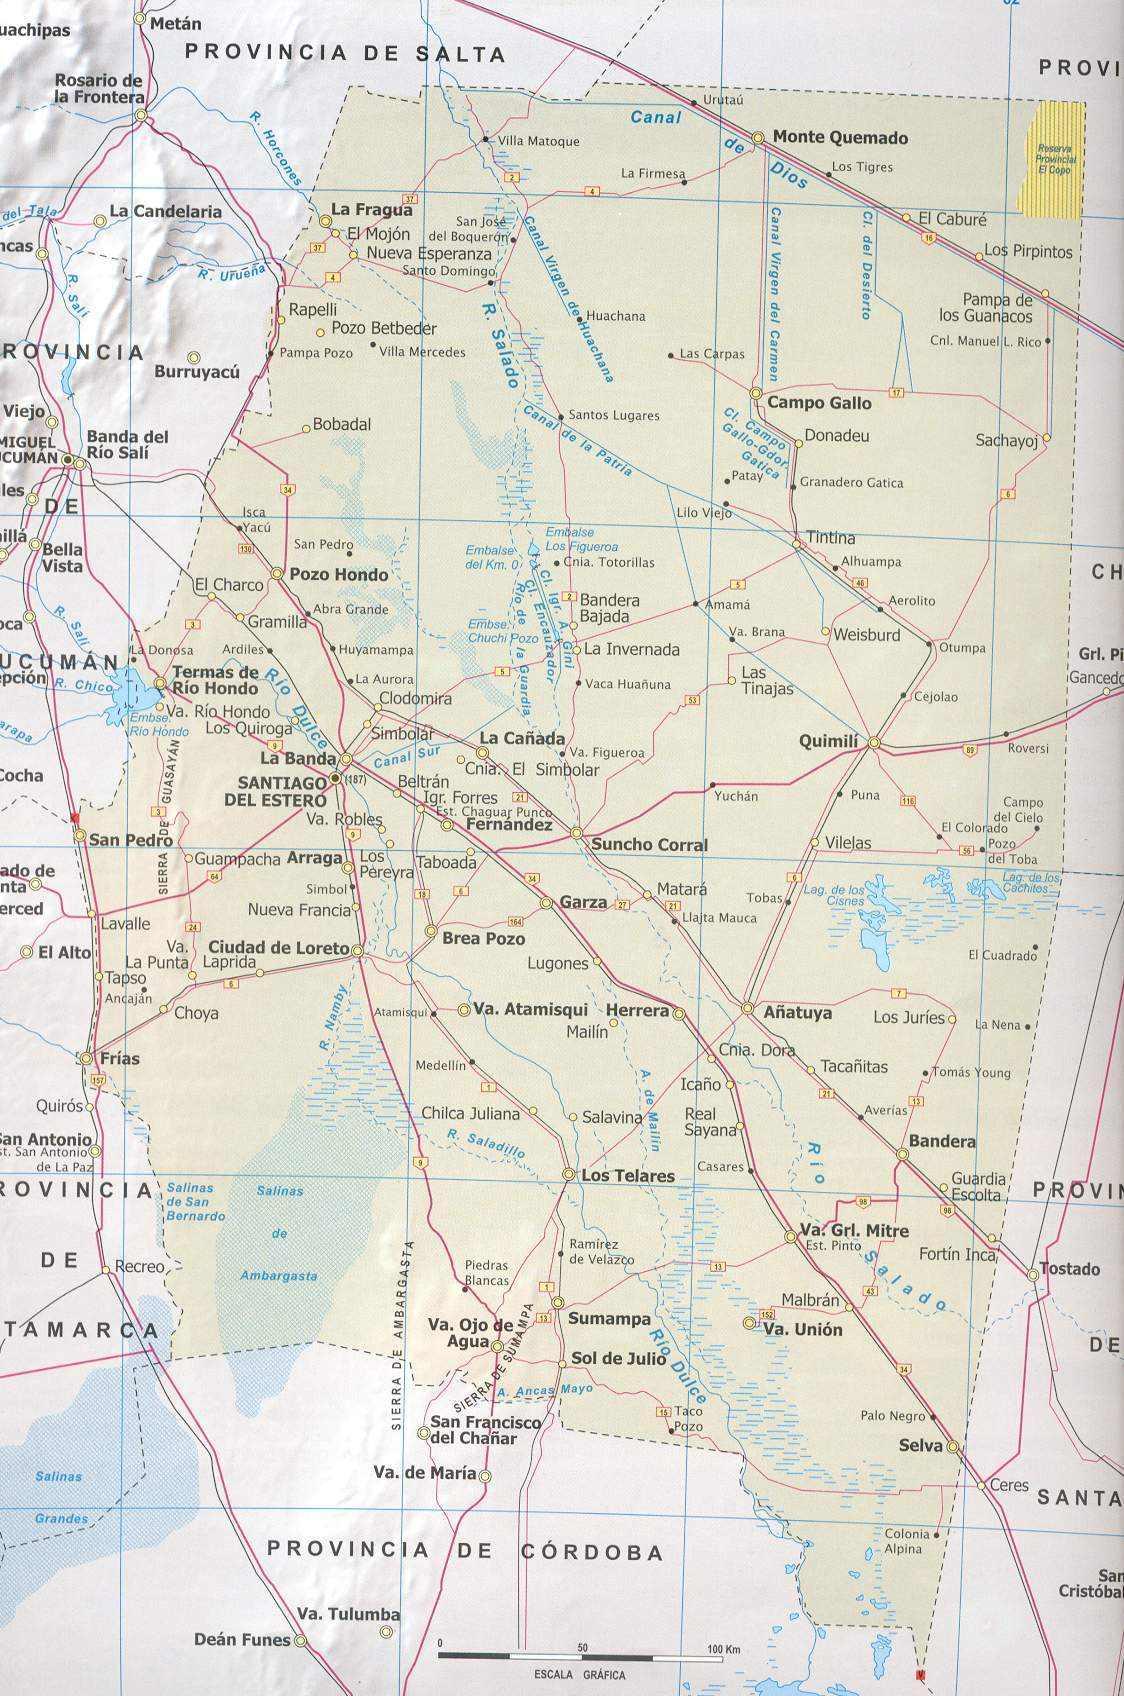 Mapa Provincia Santiago del Estero, Argentina